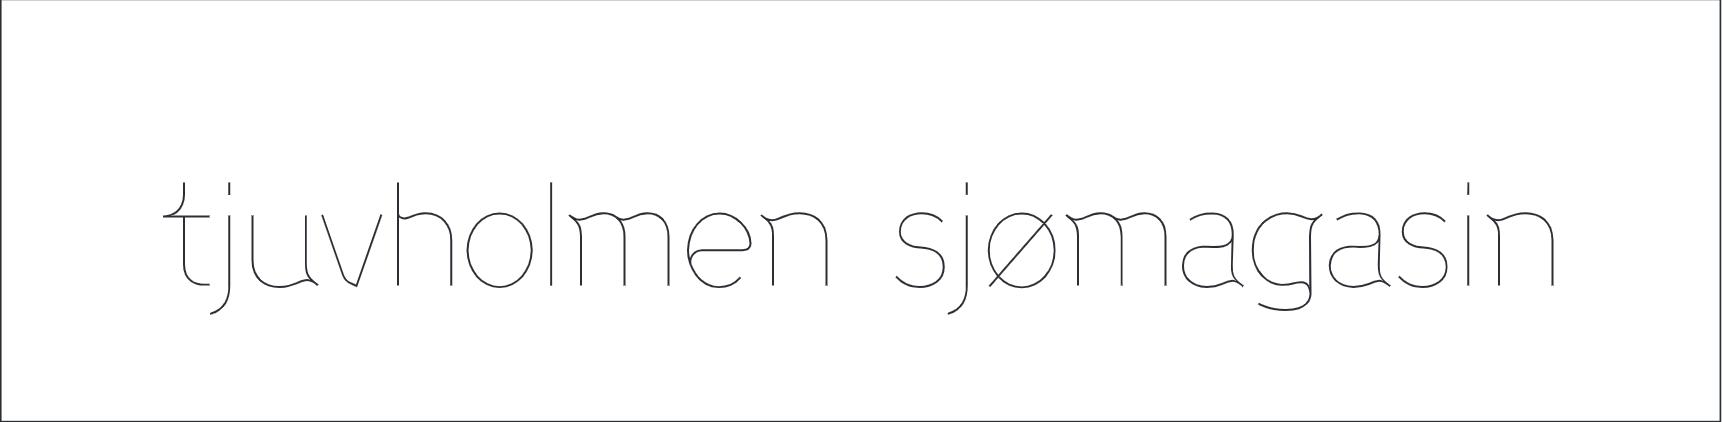 tjuvholmen-sjmagasin-logo-stor-hvit